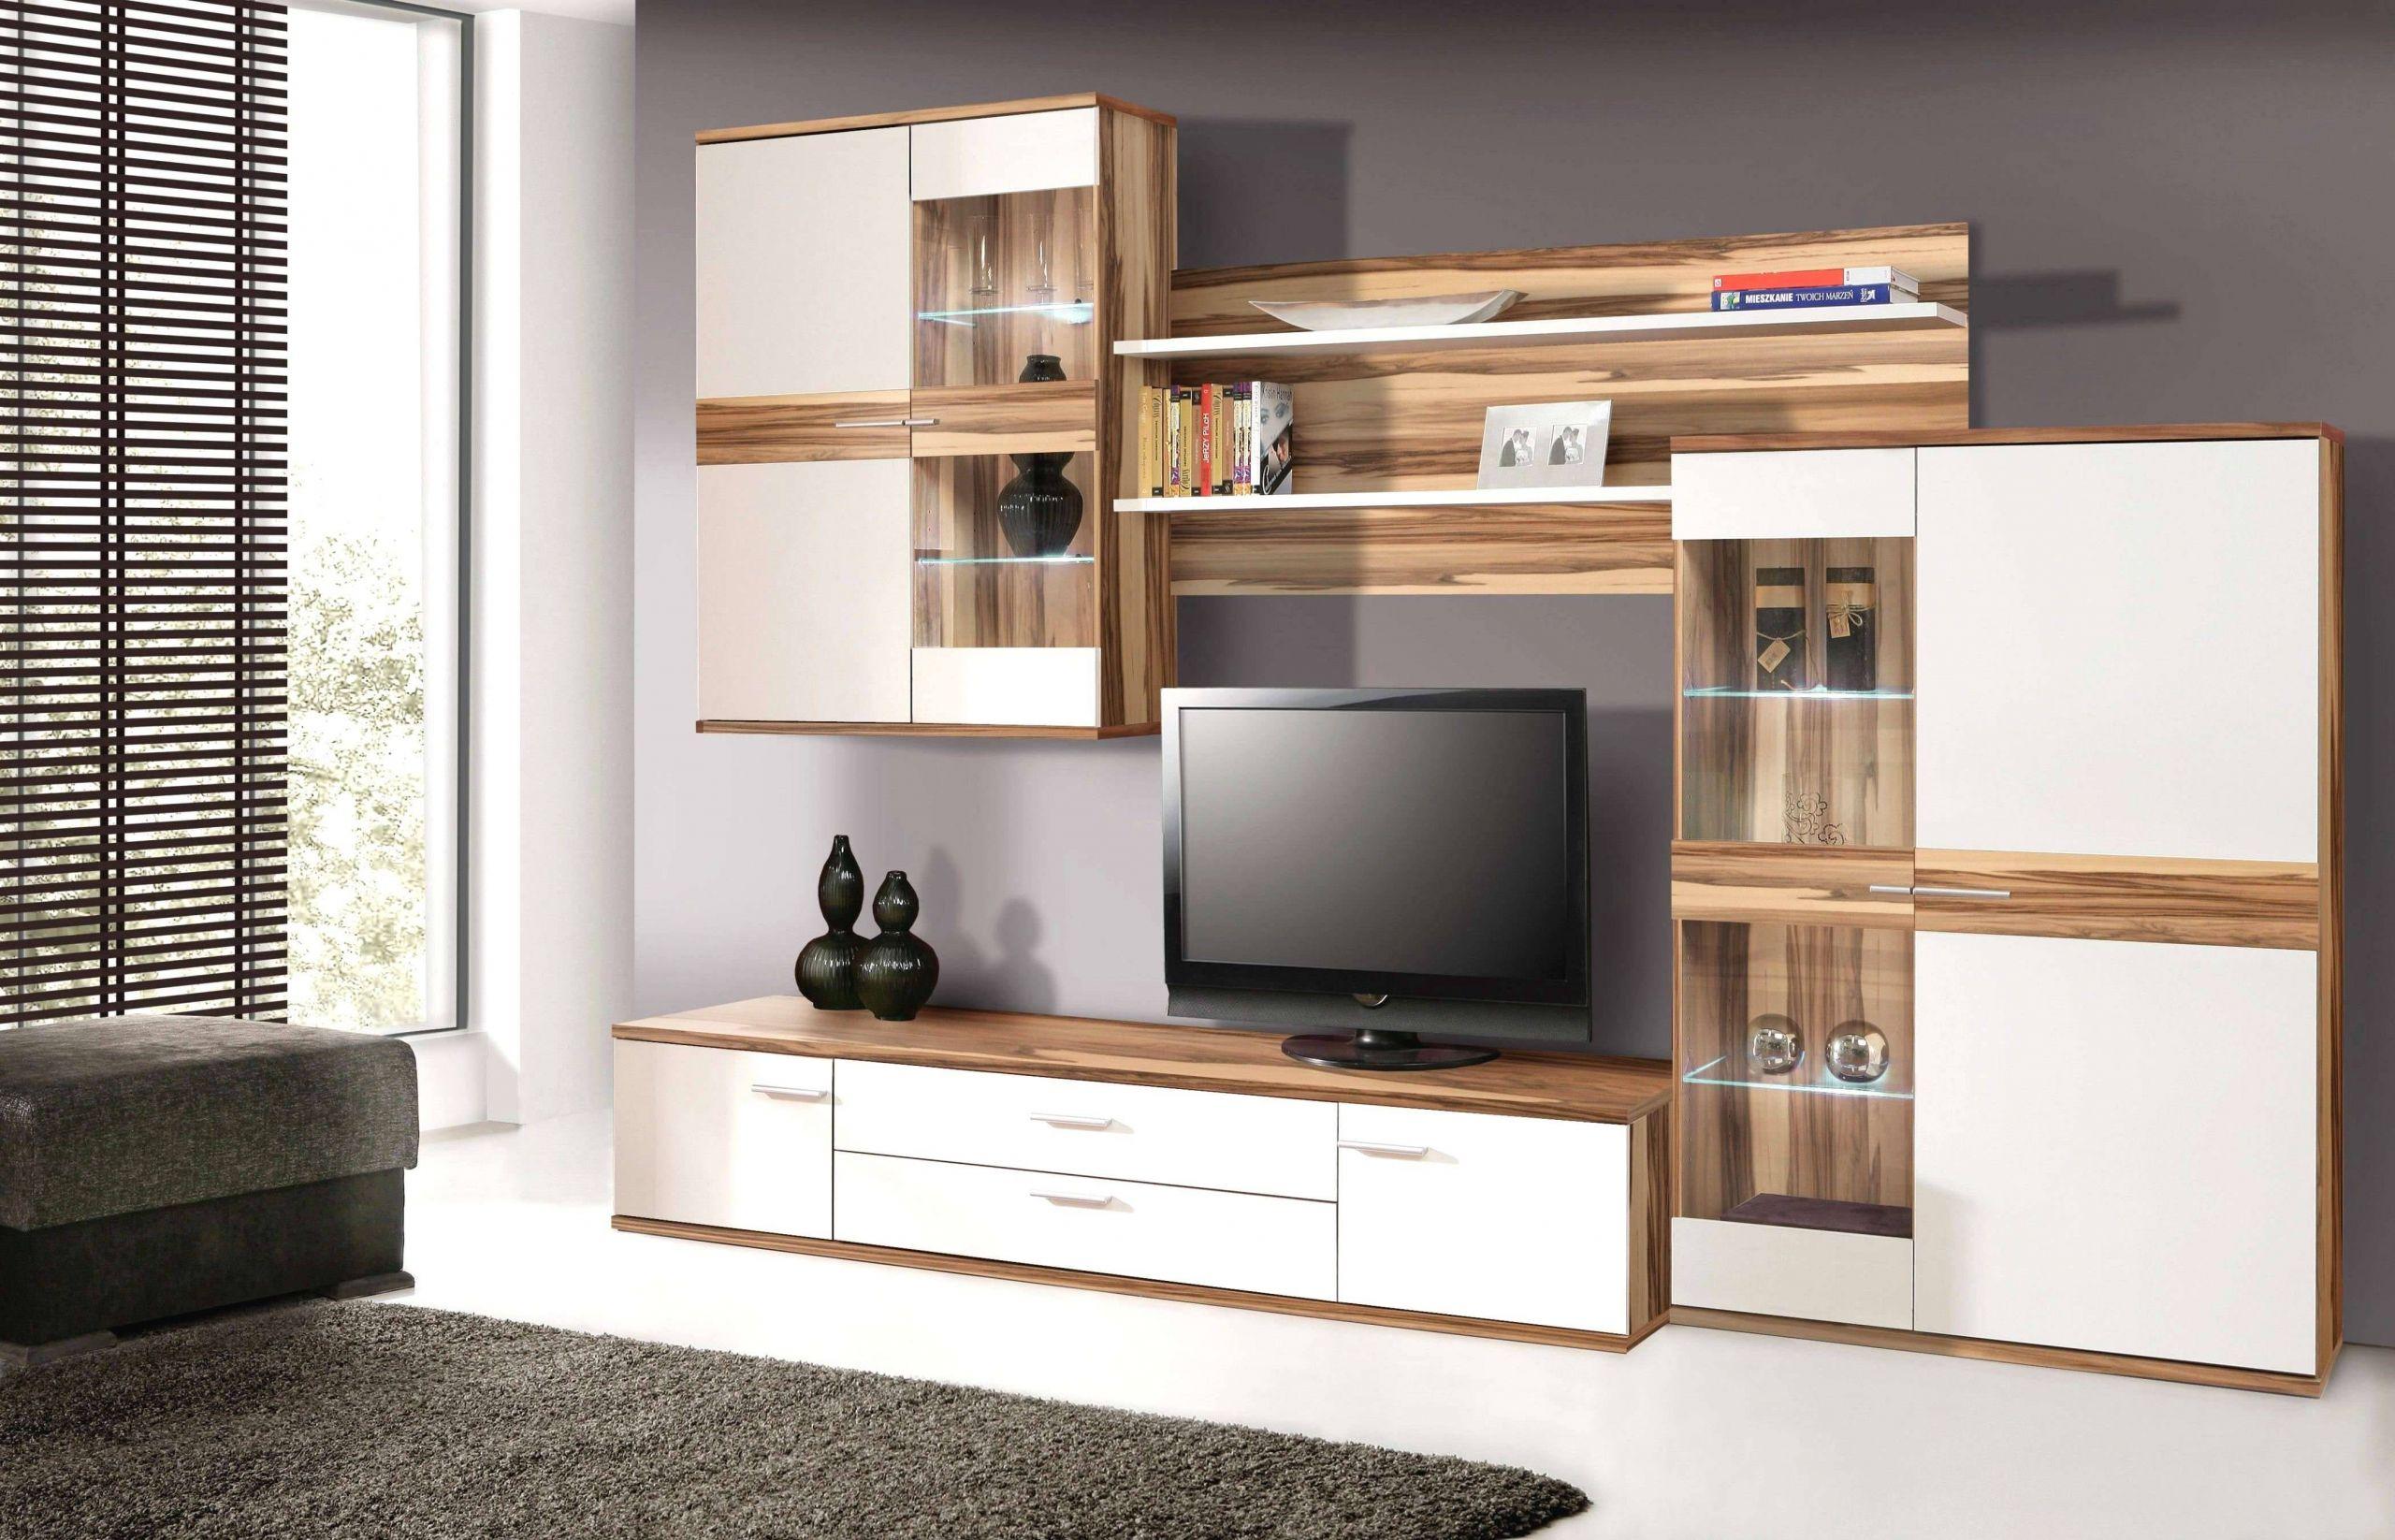 Deko Ideen Neu Wohnzimmerschrank Quadratisch Best Fernsehwand Ideen